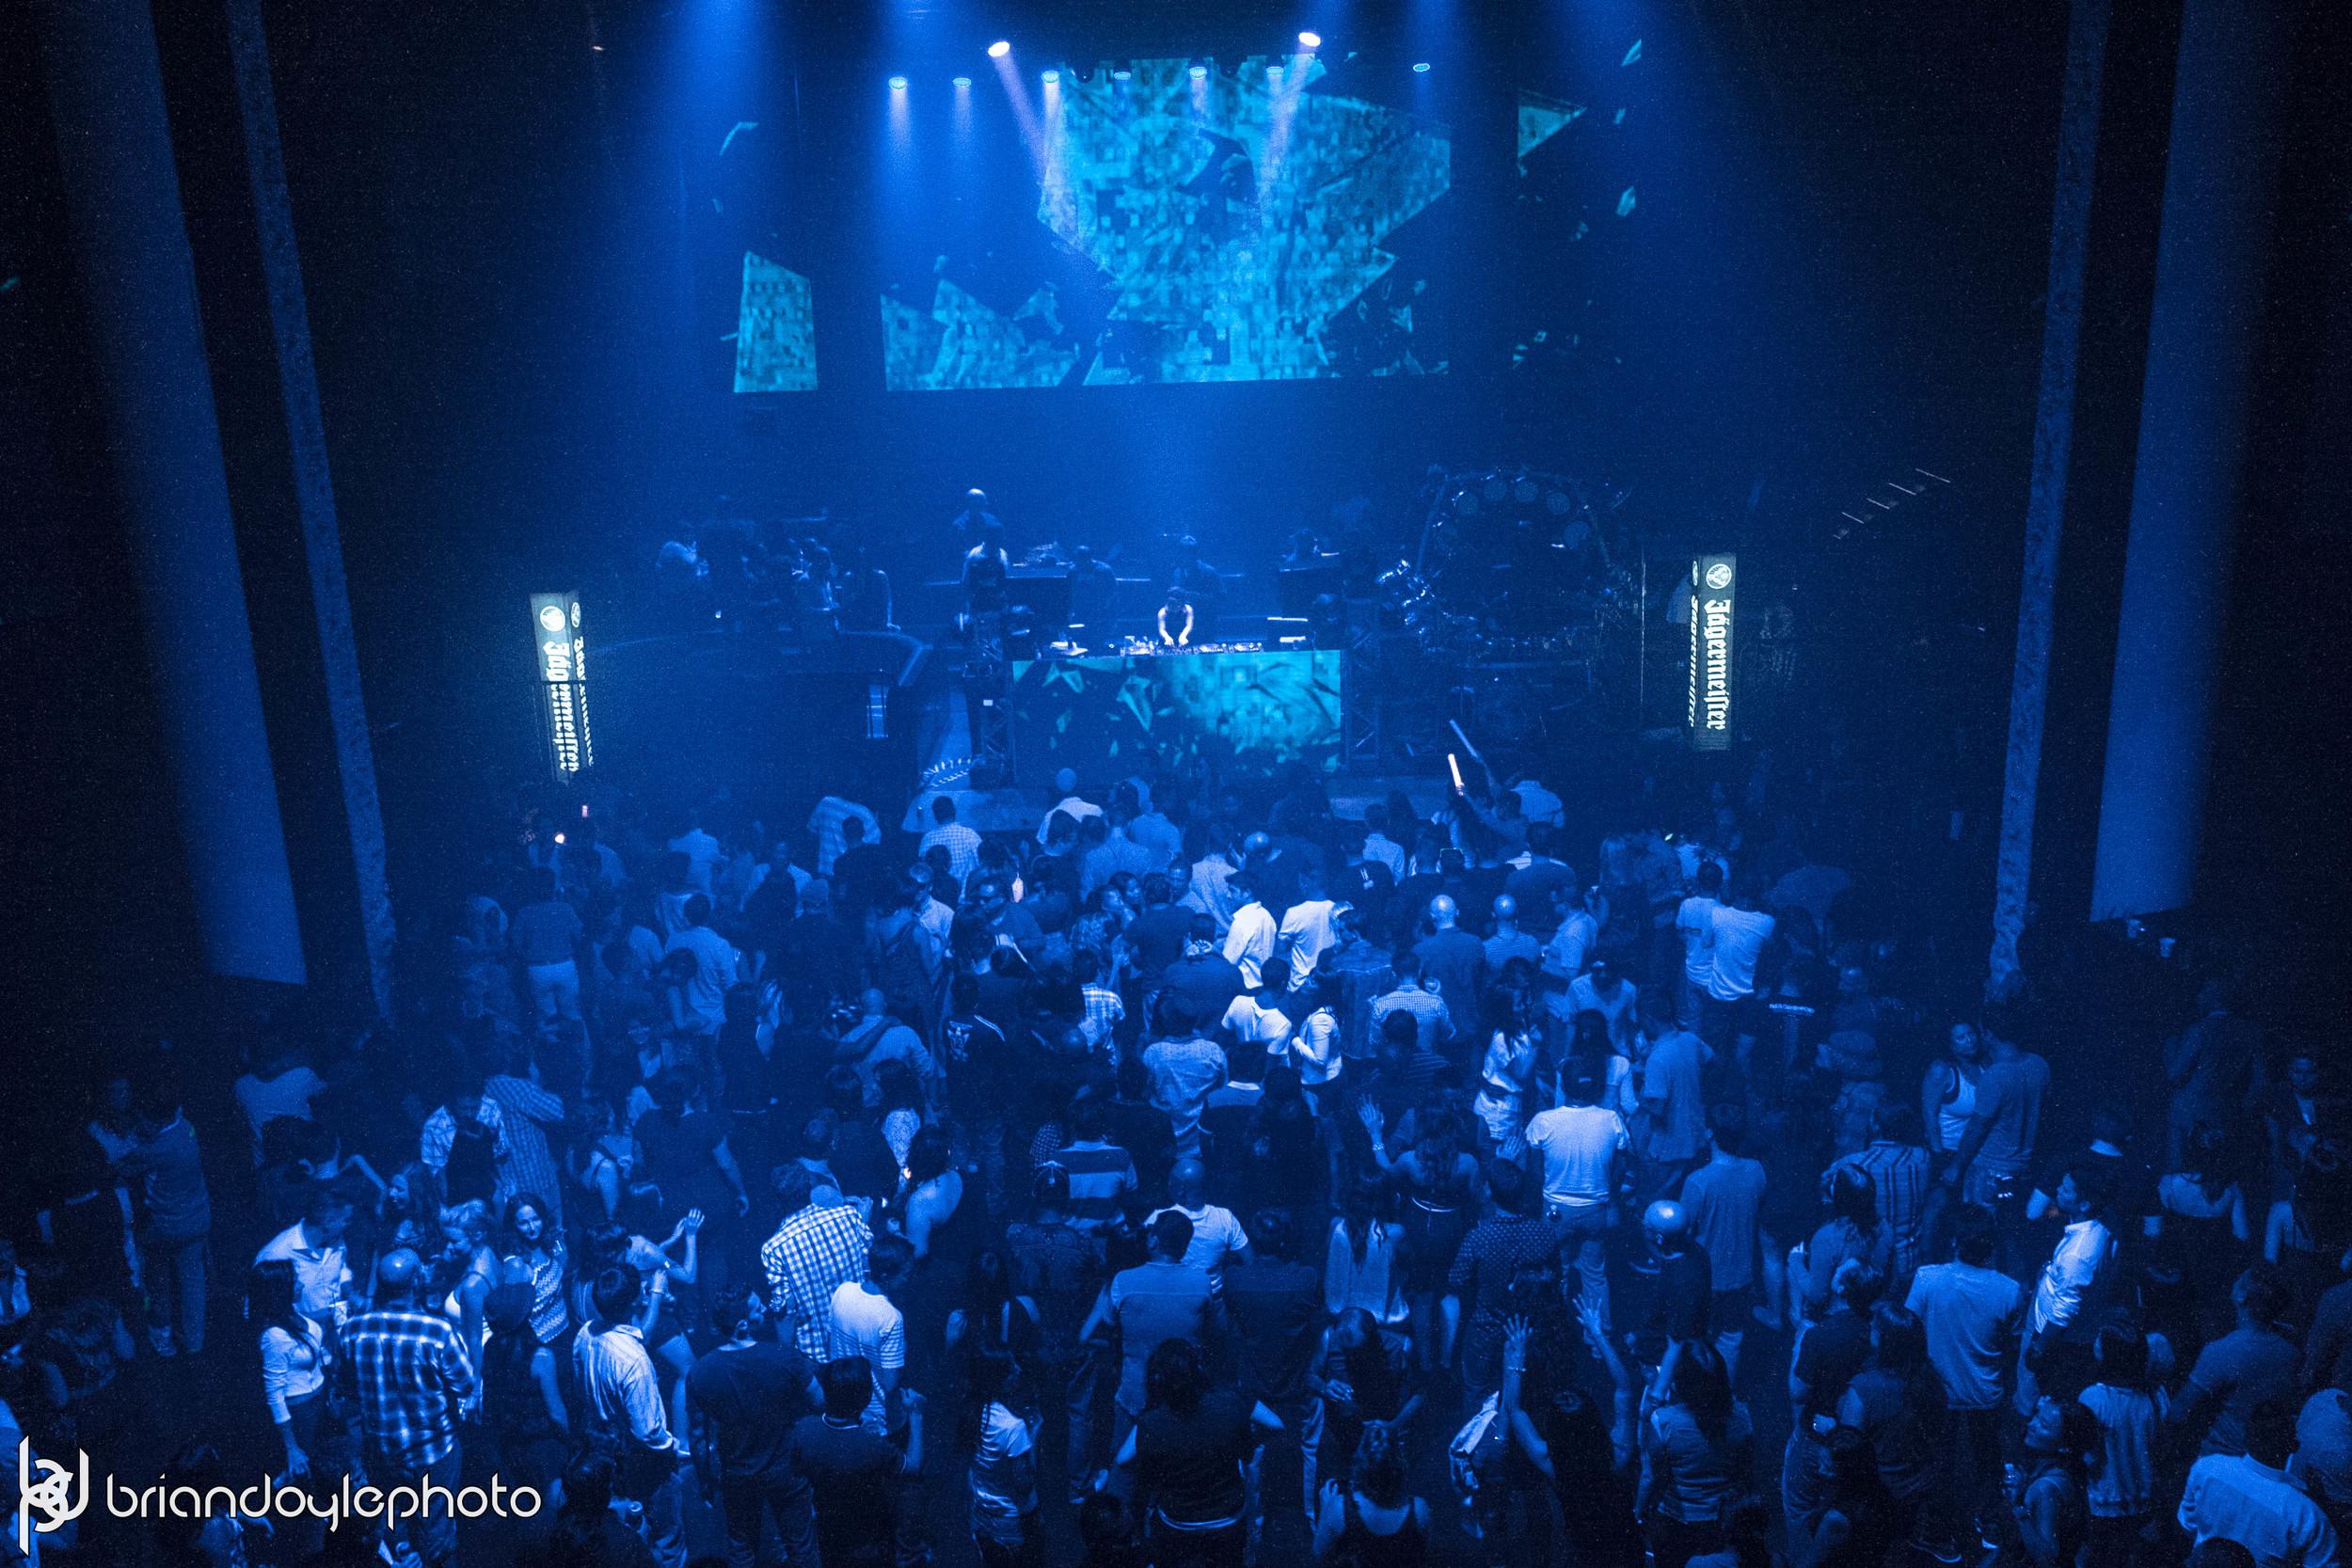 Jagermeister Presents - Paul Oakenfold @ Avalon bdp 27.09.14-14.jpg